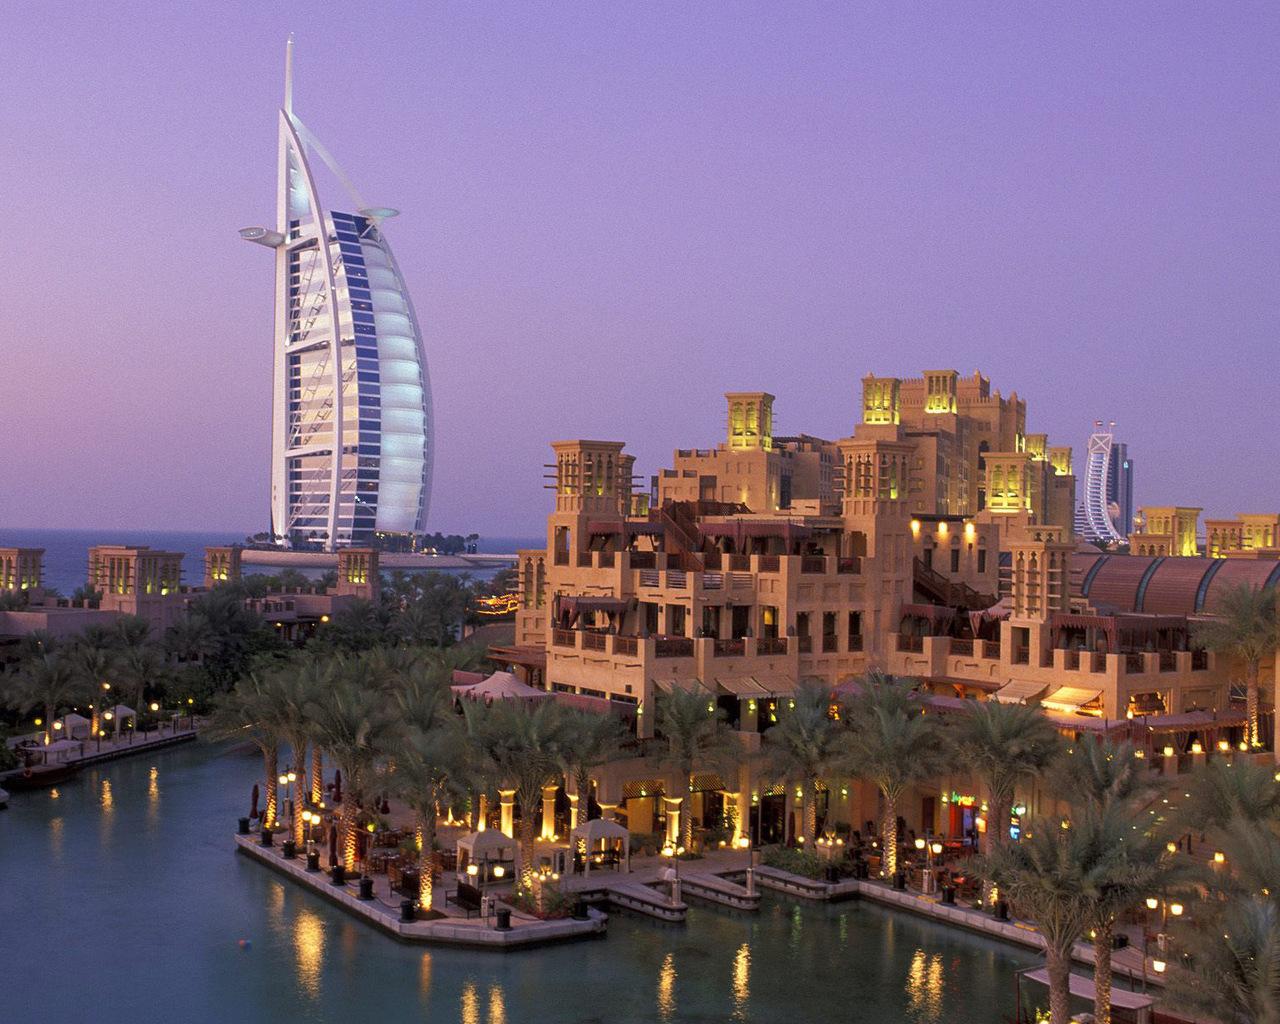 Pictures UAE Dubai Burj Al Arab pictures wallpaper download 1280x1024